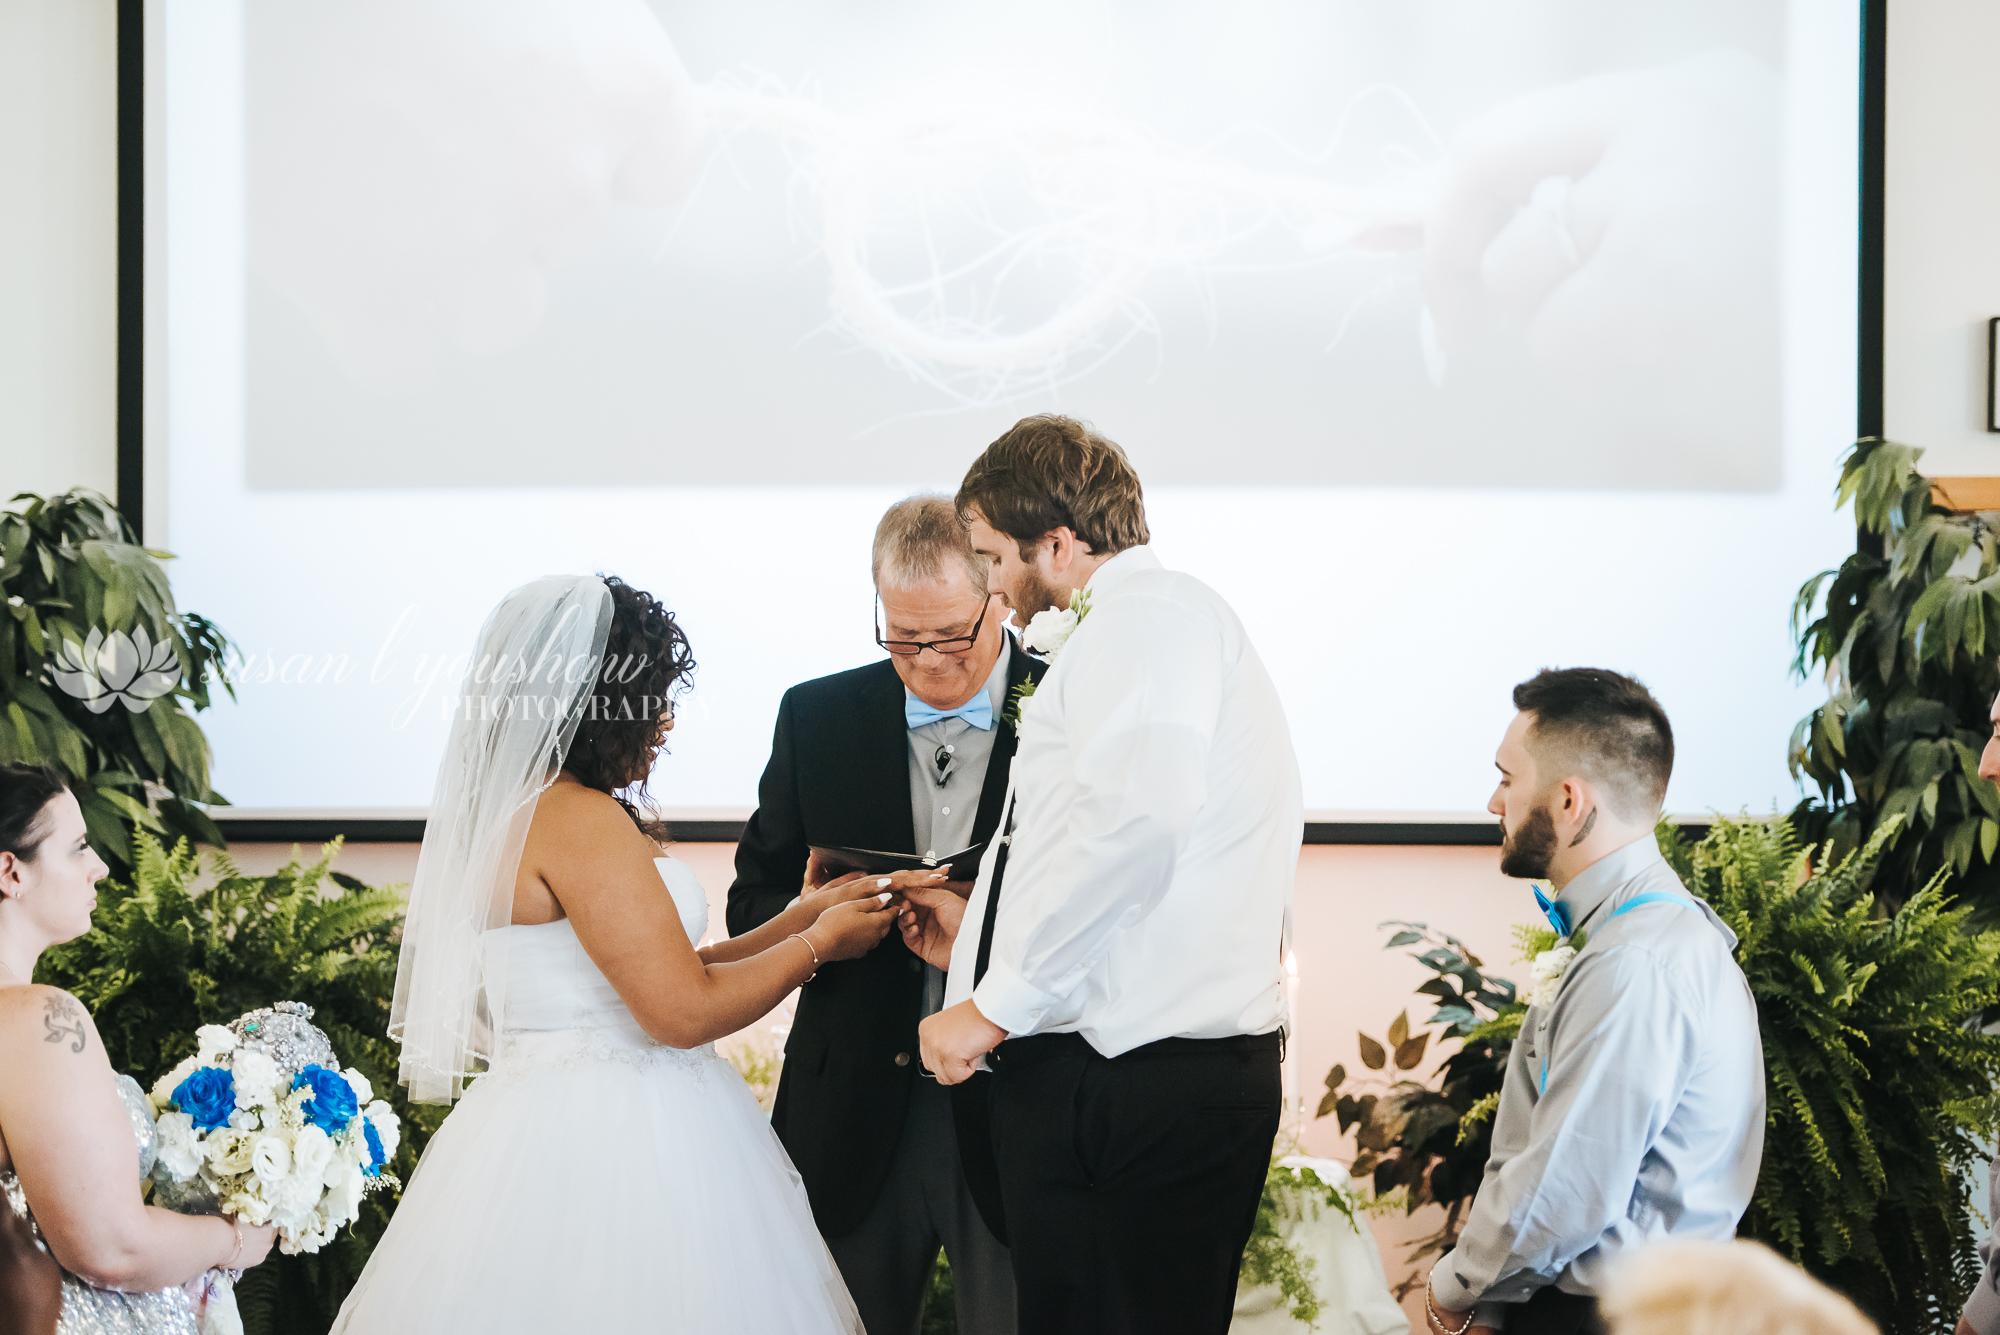 Katelyn and Wes Wedding Photos 07-13-2019 SLY Photography-74.jpg